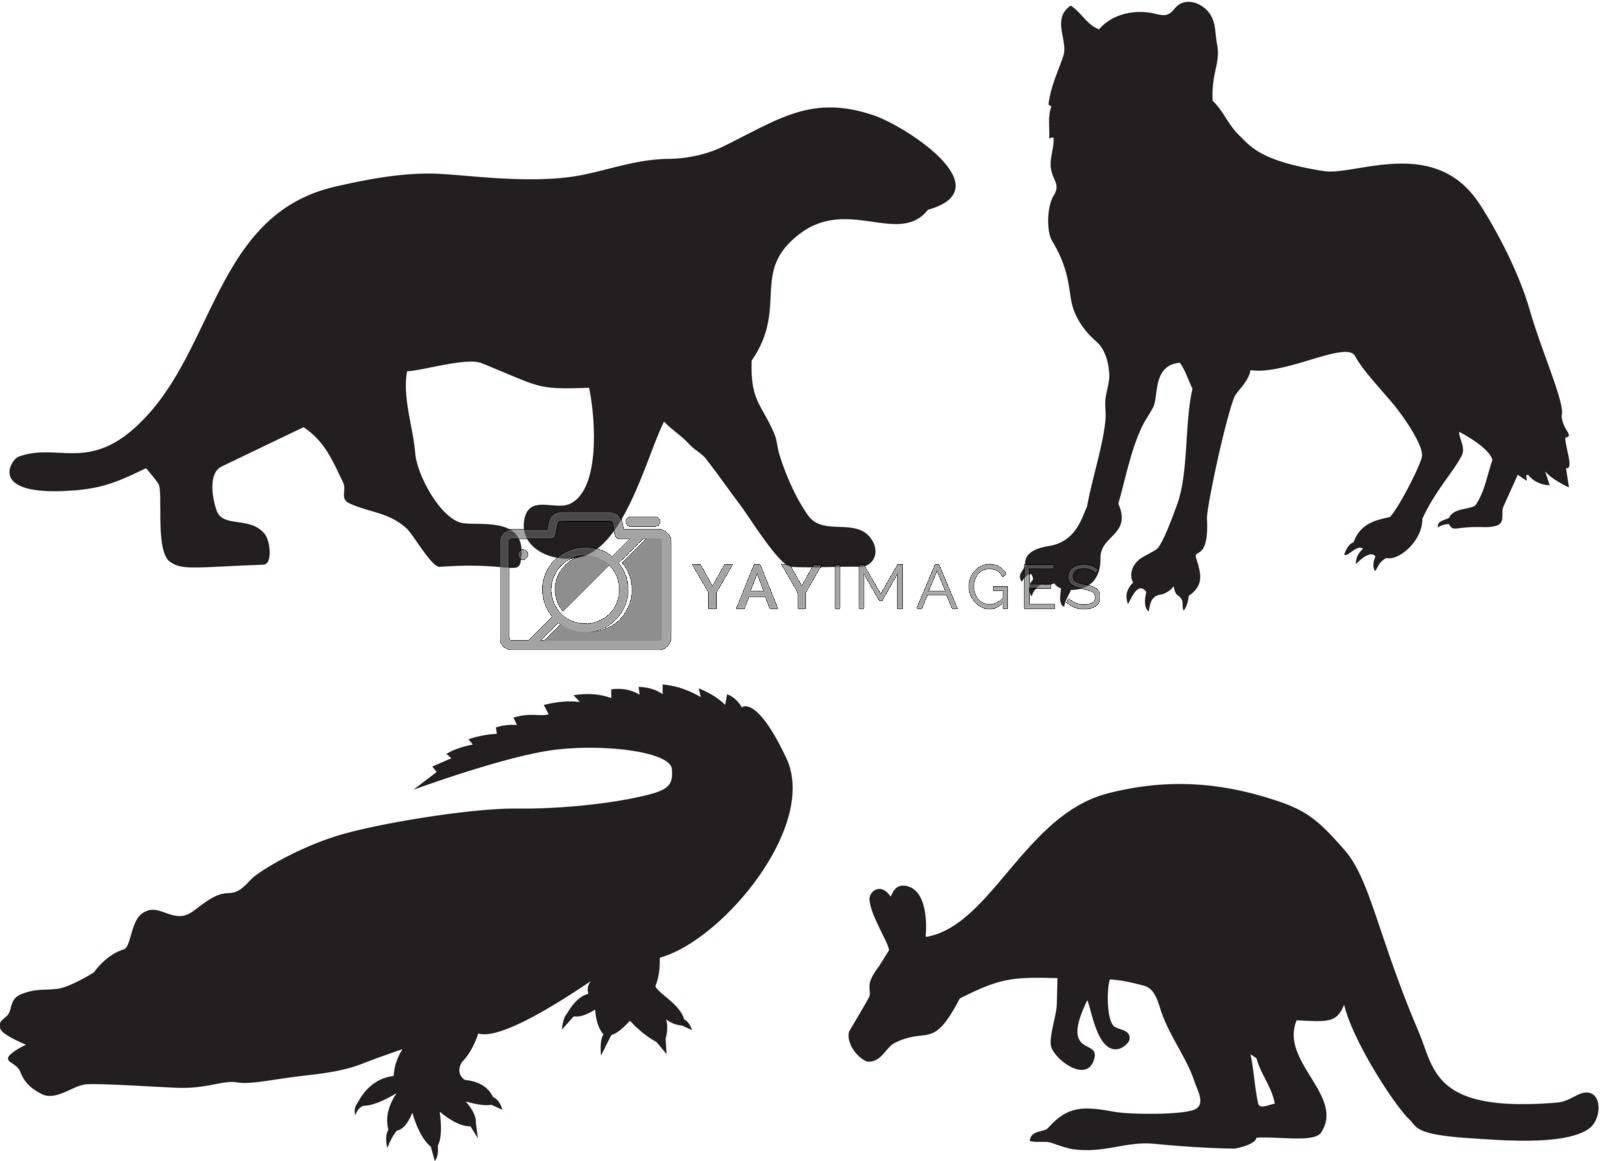 Illustration of wildlife animals silhouettes.